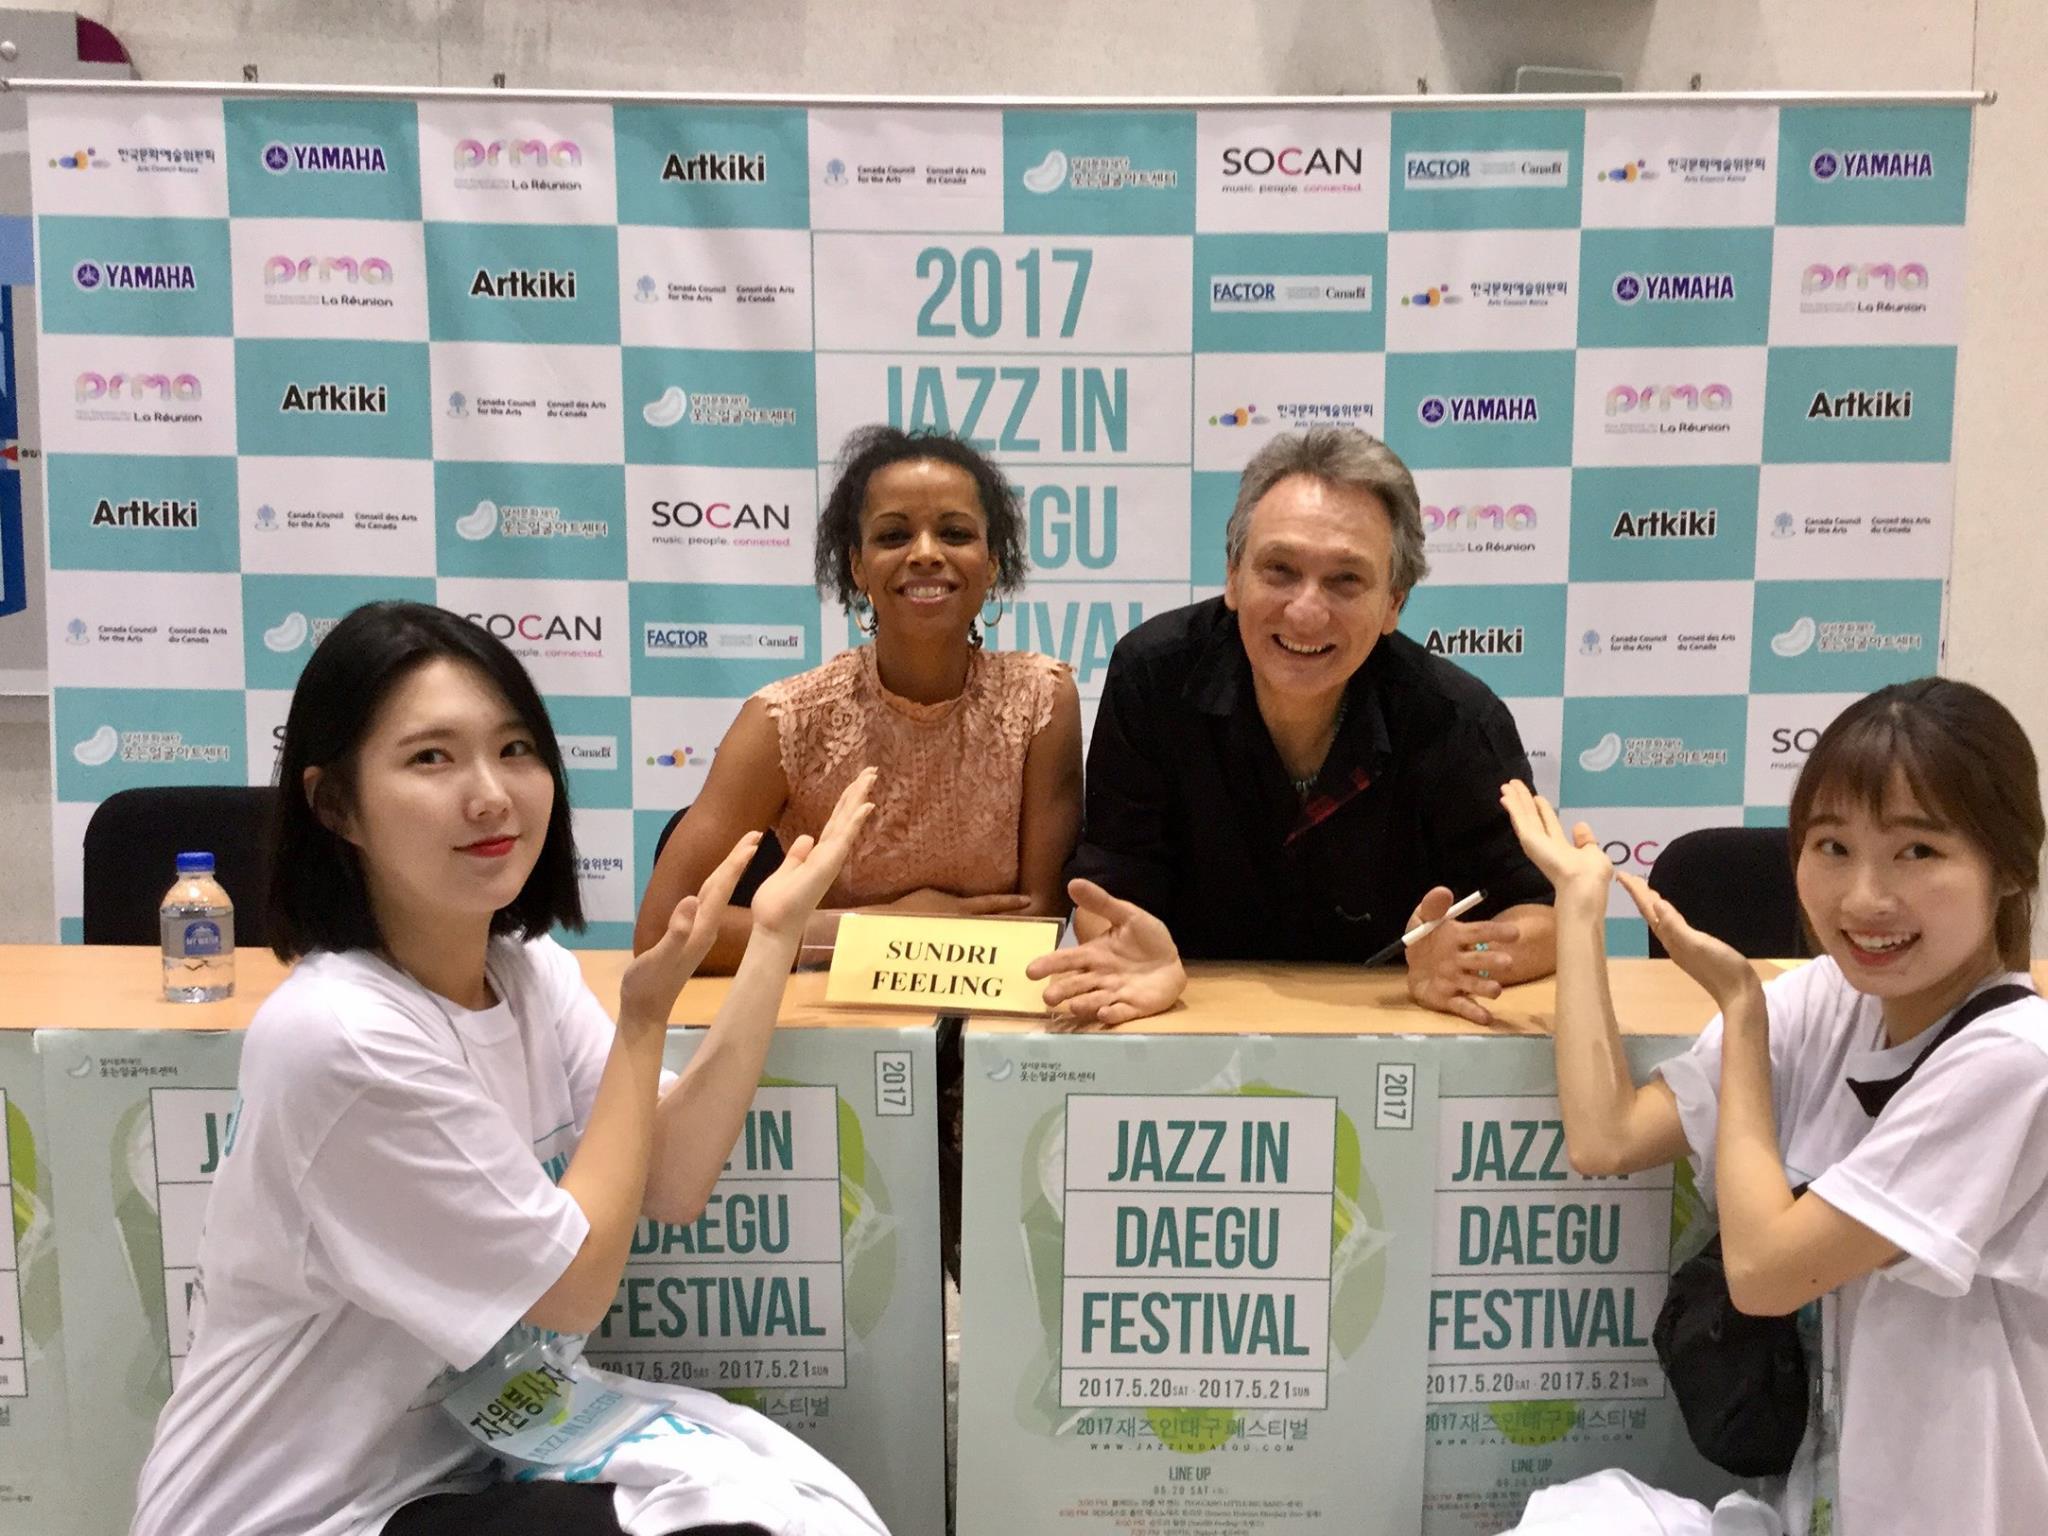 Jazz In Daegu Festival 2017